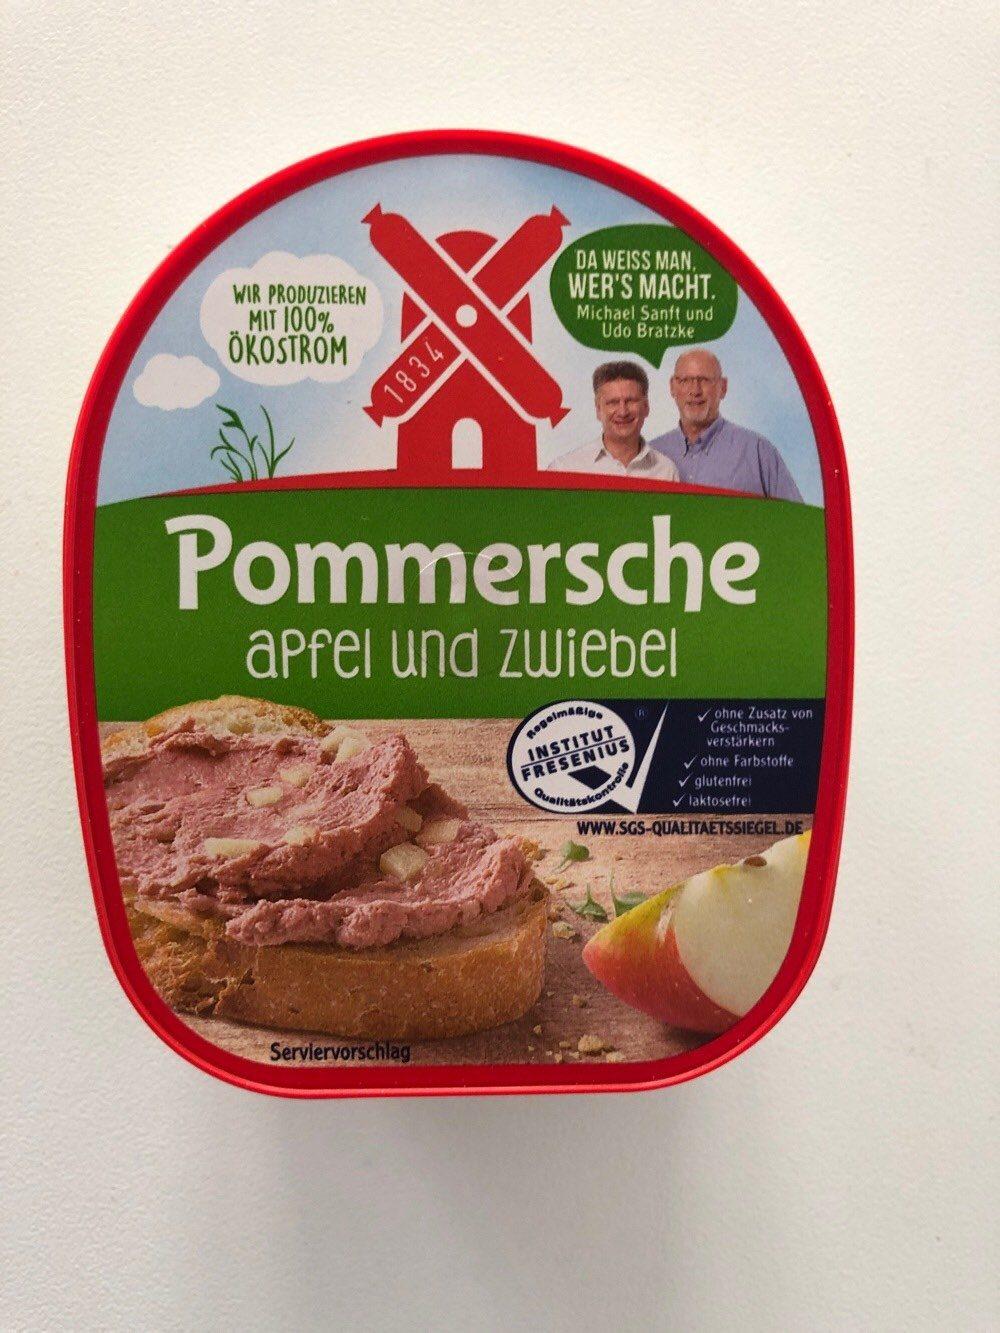 Pommersche Apfel und Zwiebel - Product - en